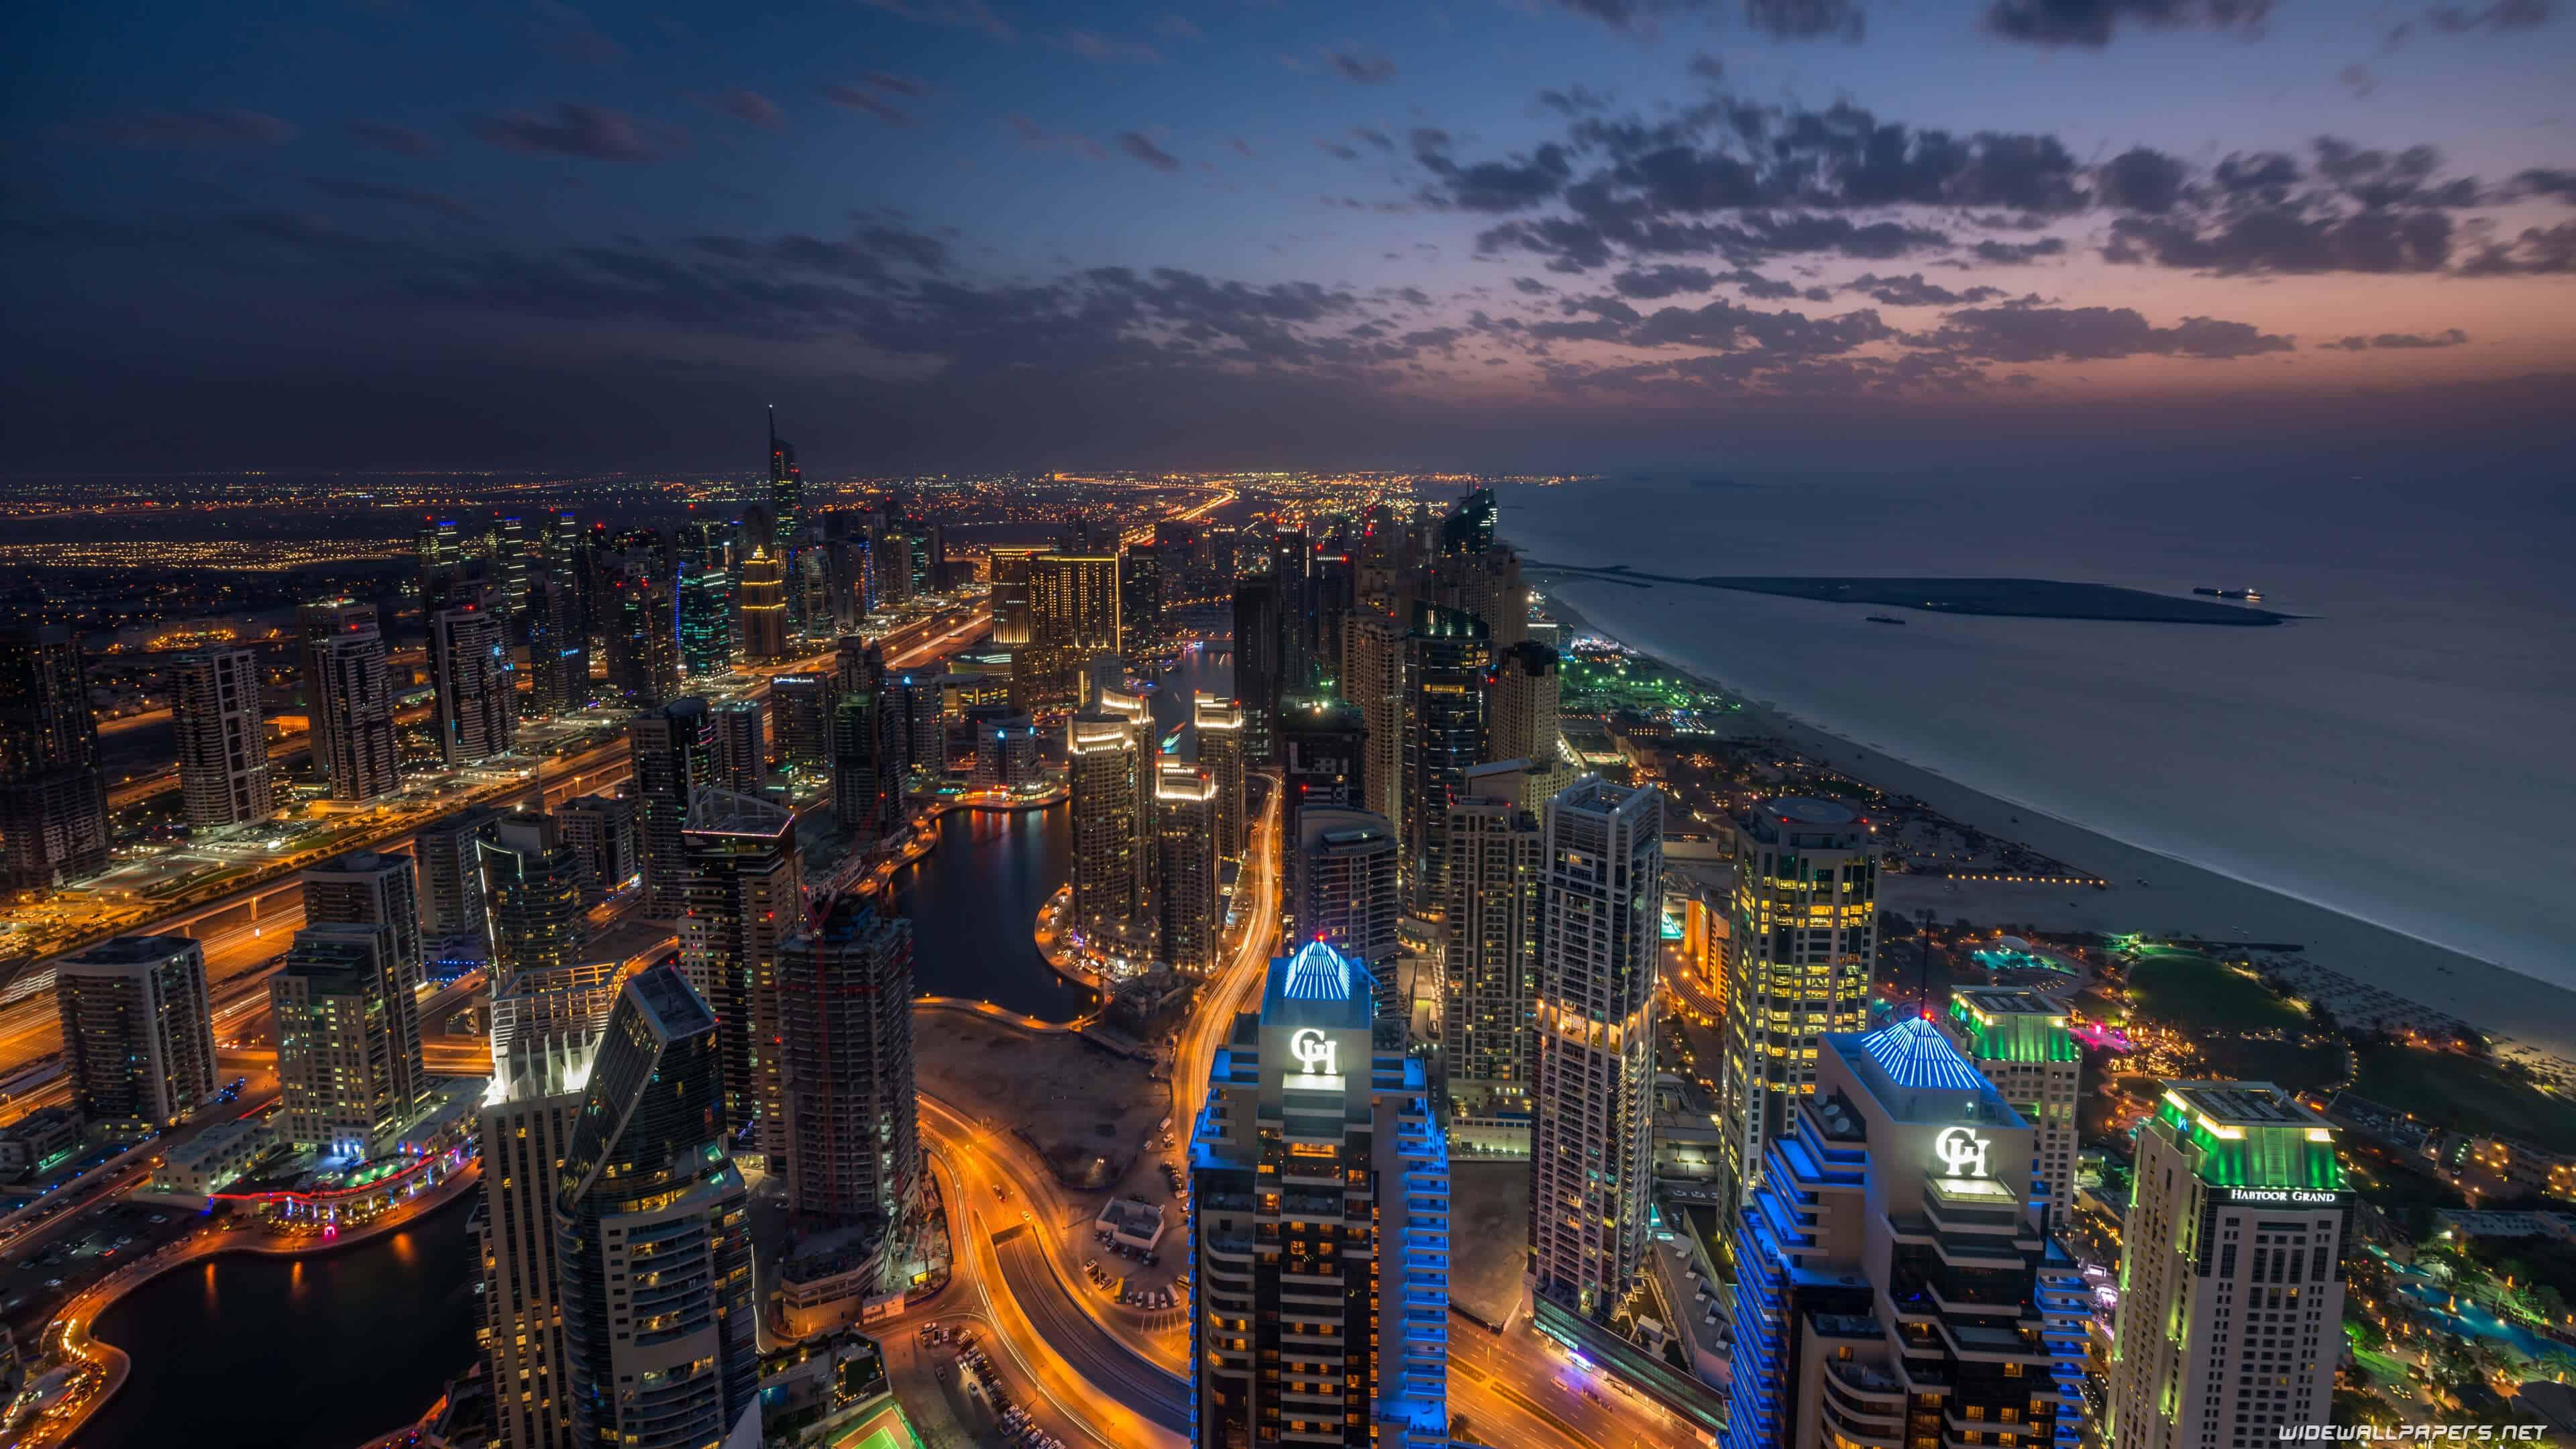 dubai marina at night, united arab emirates uhd 4k wallpaper | pixelz